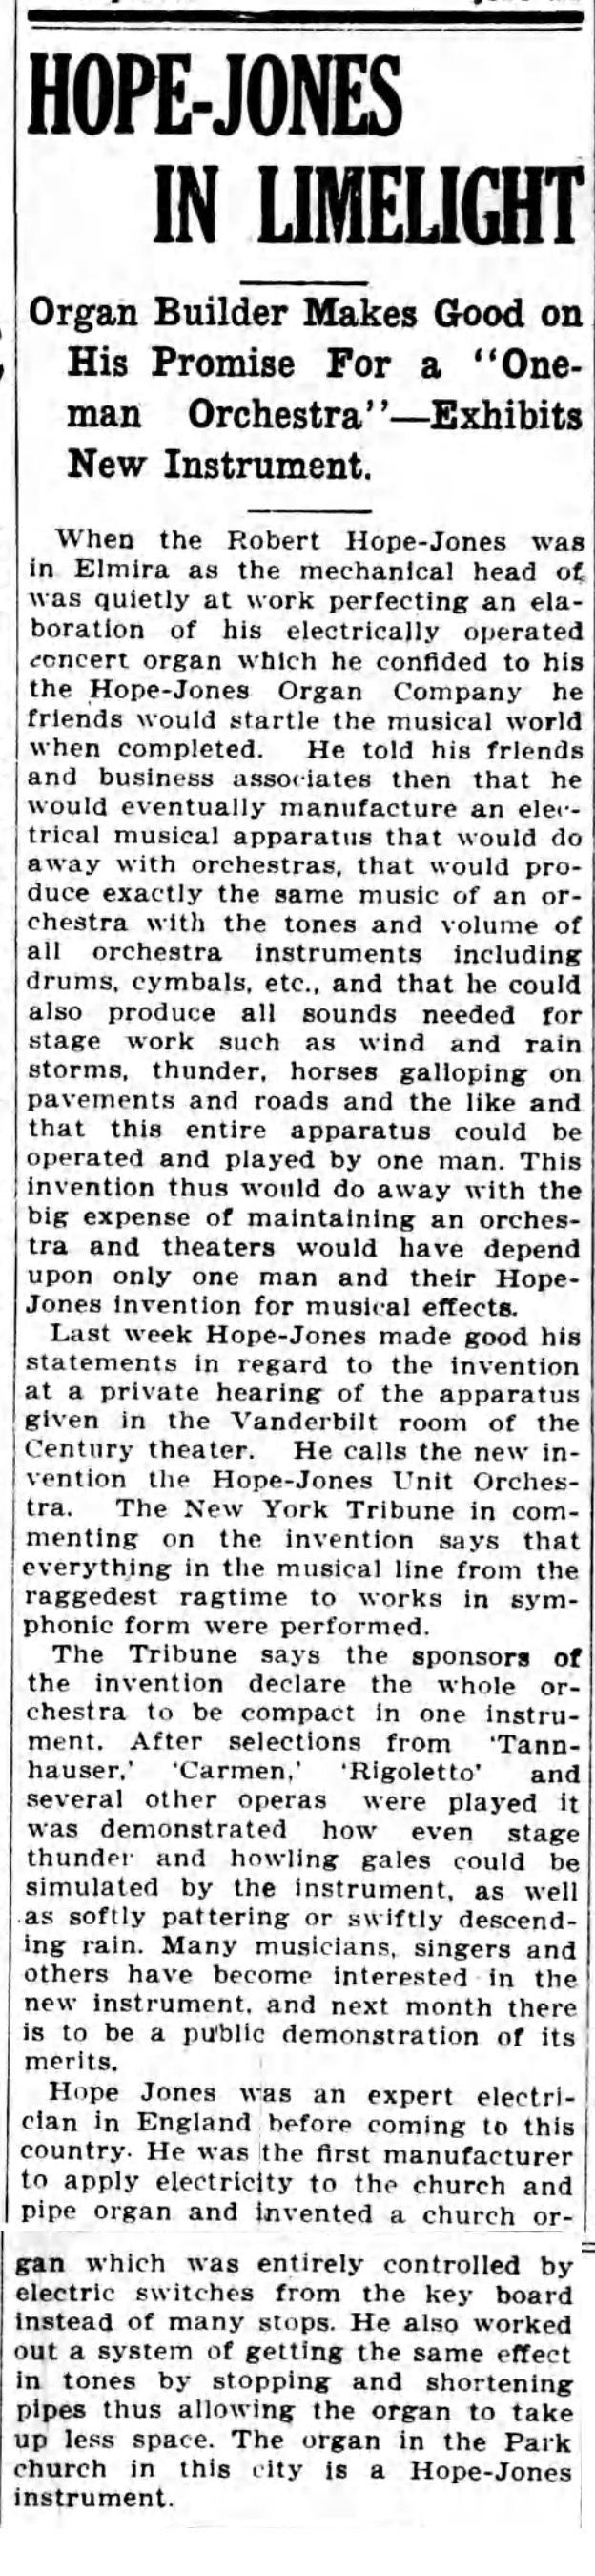 Hope-Jones in limelight, Delivers one-man orchestra article (Elmira Star-Gazette, 1912-07-15).jpg